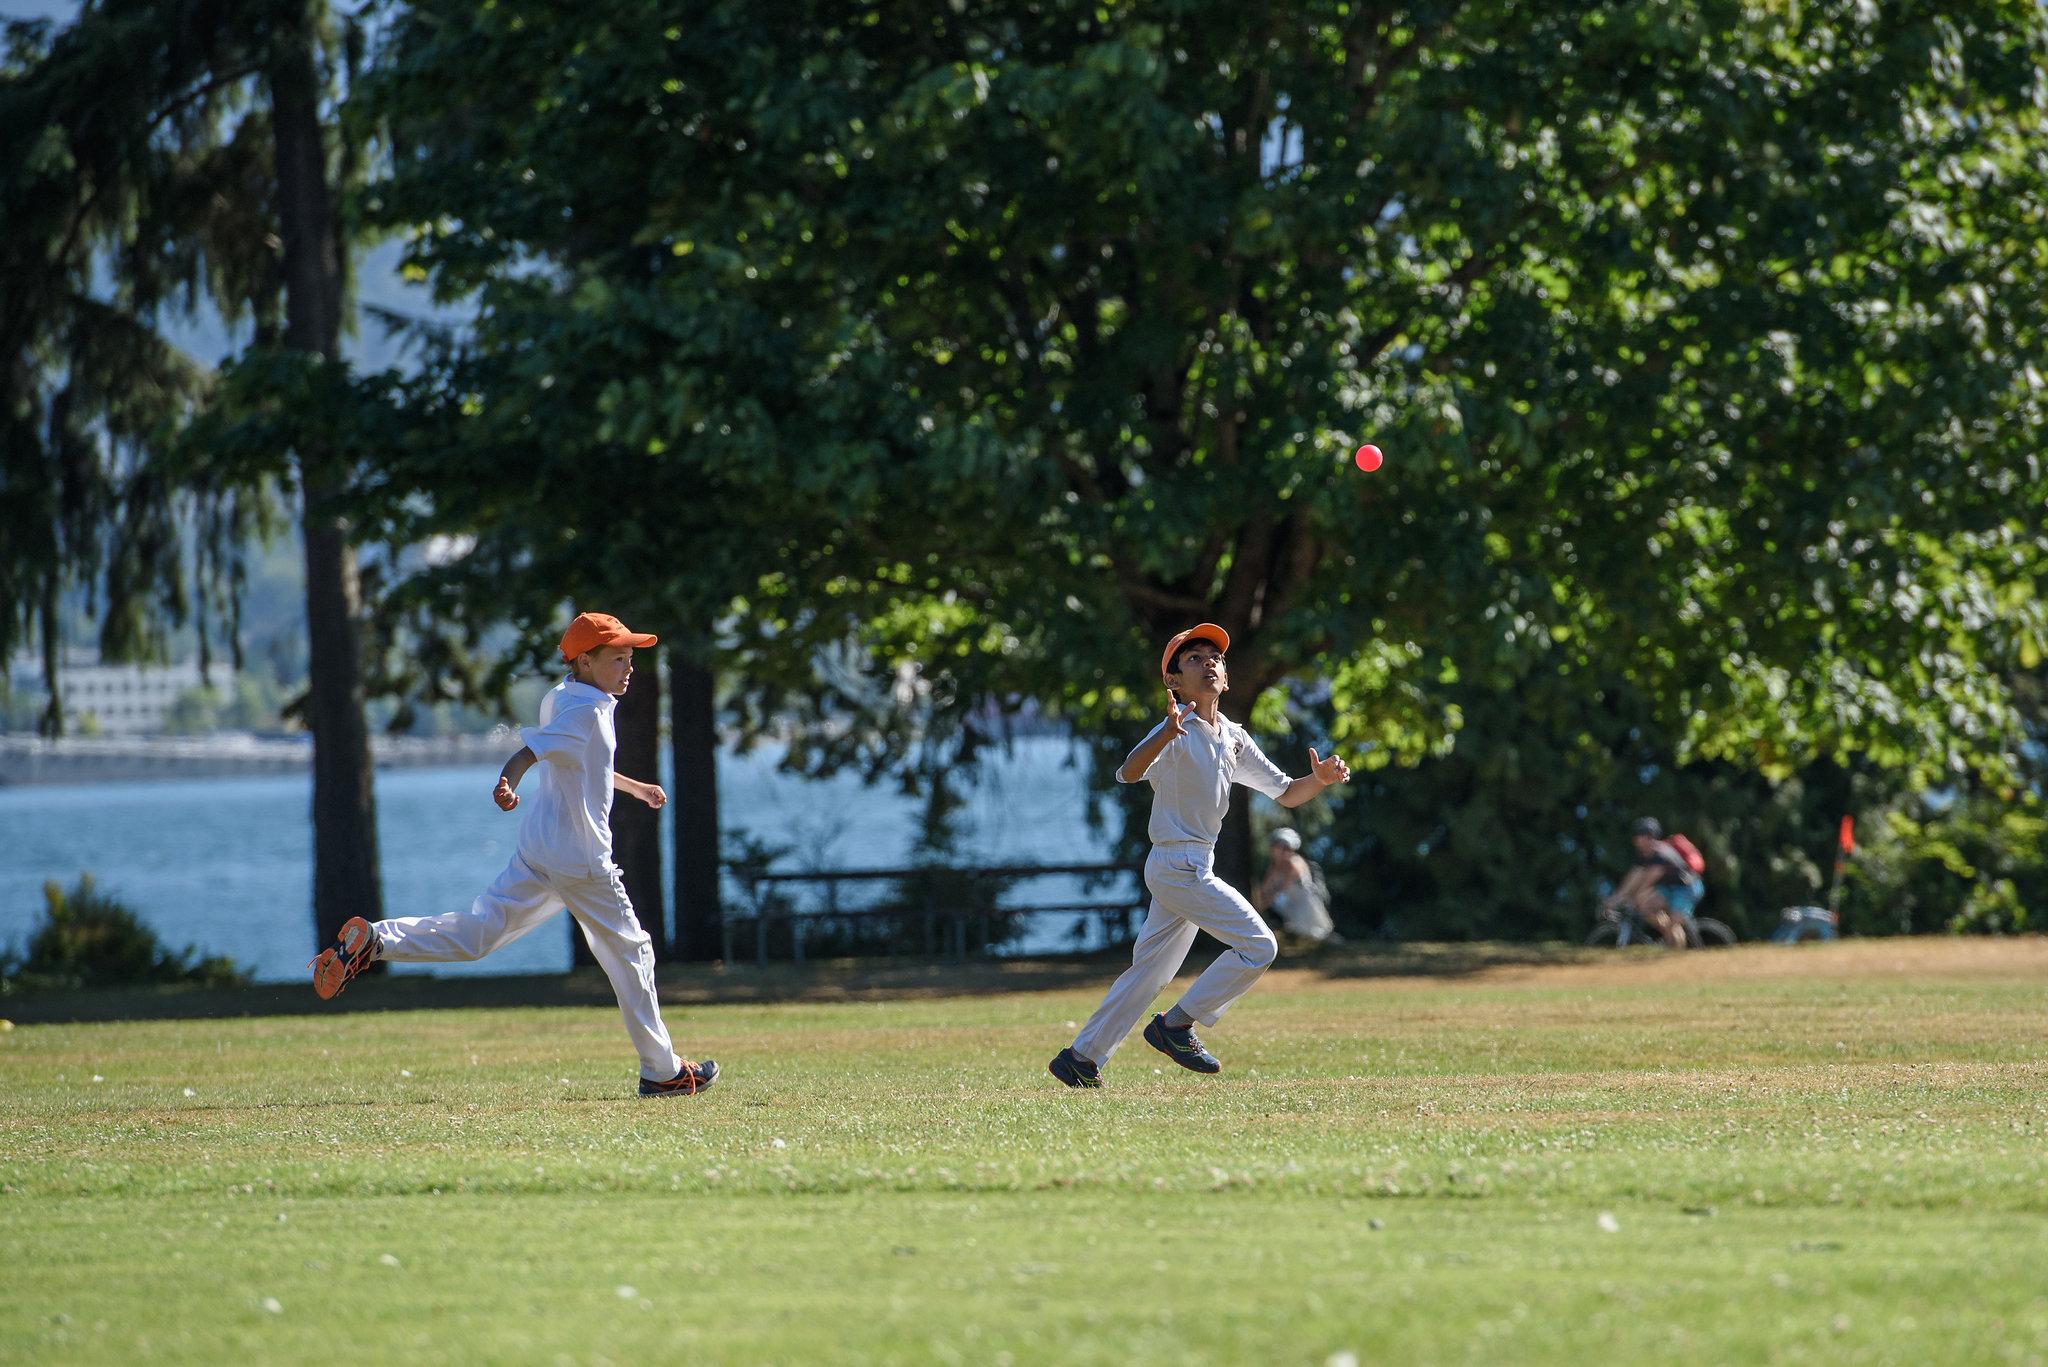 21stops-20170729-Meraloma-Juniors-Season-Finale-0047.jpg